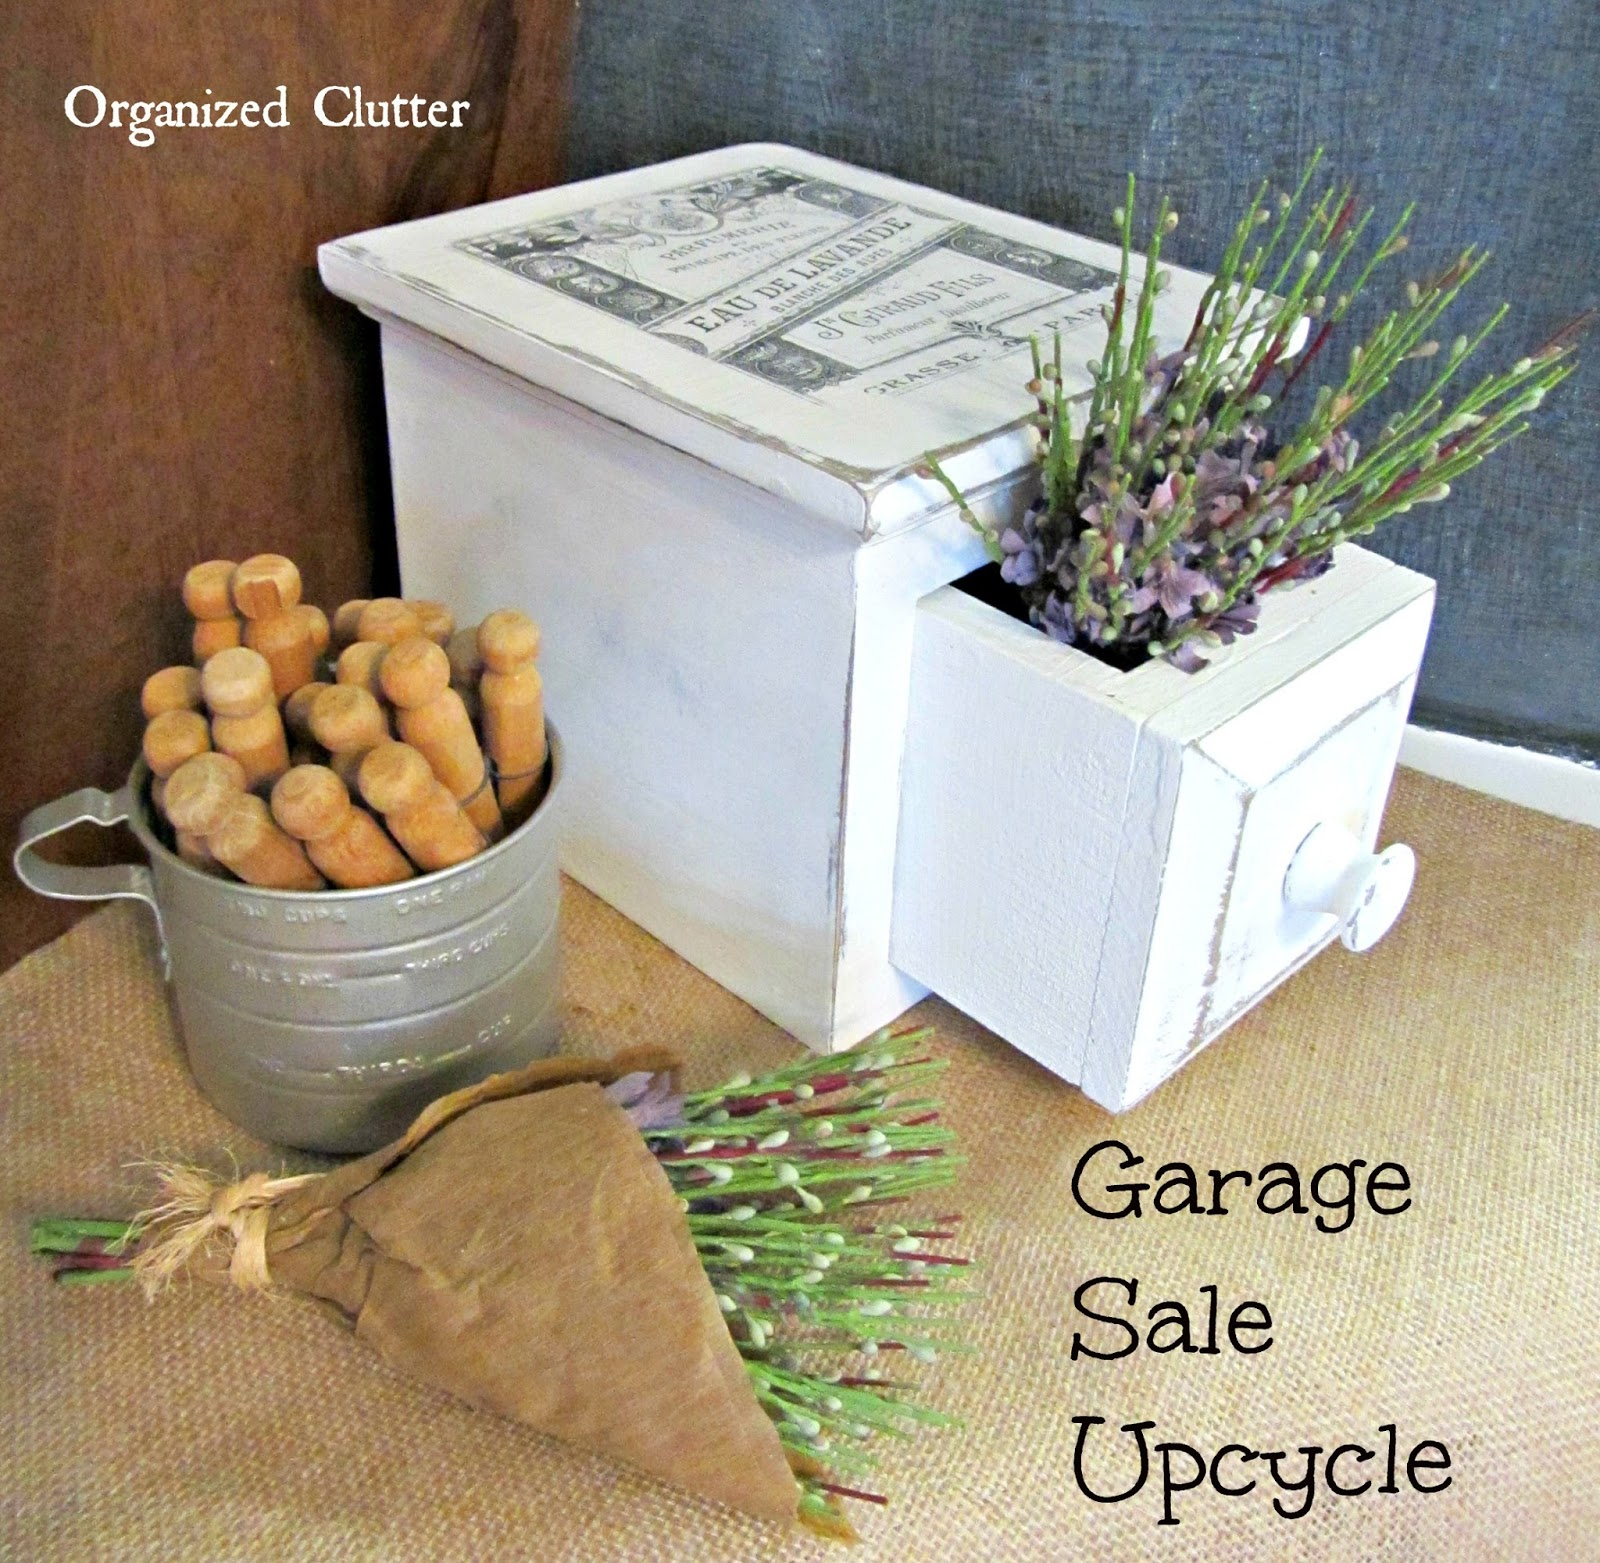 Upcycled Garage Sale Potpourri Drawer www.organizedclutterqueen.blogspot.com